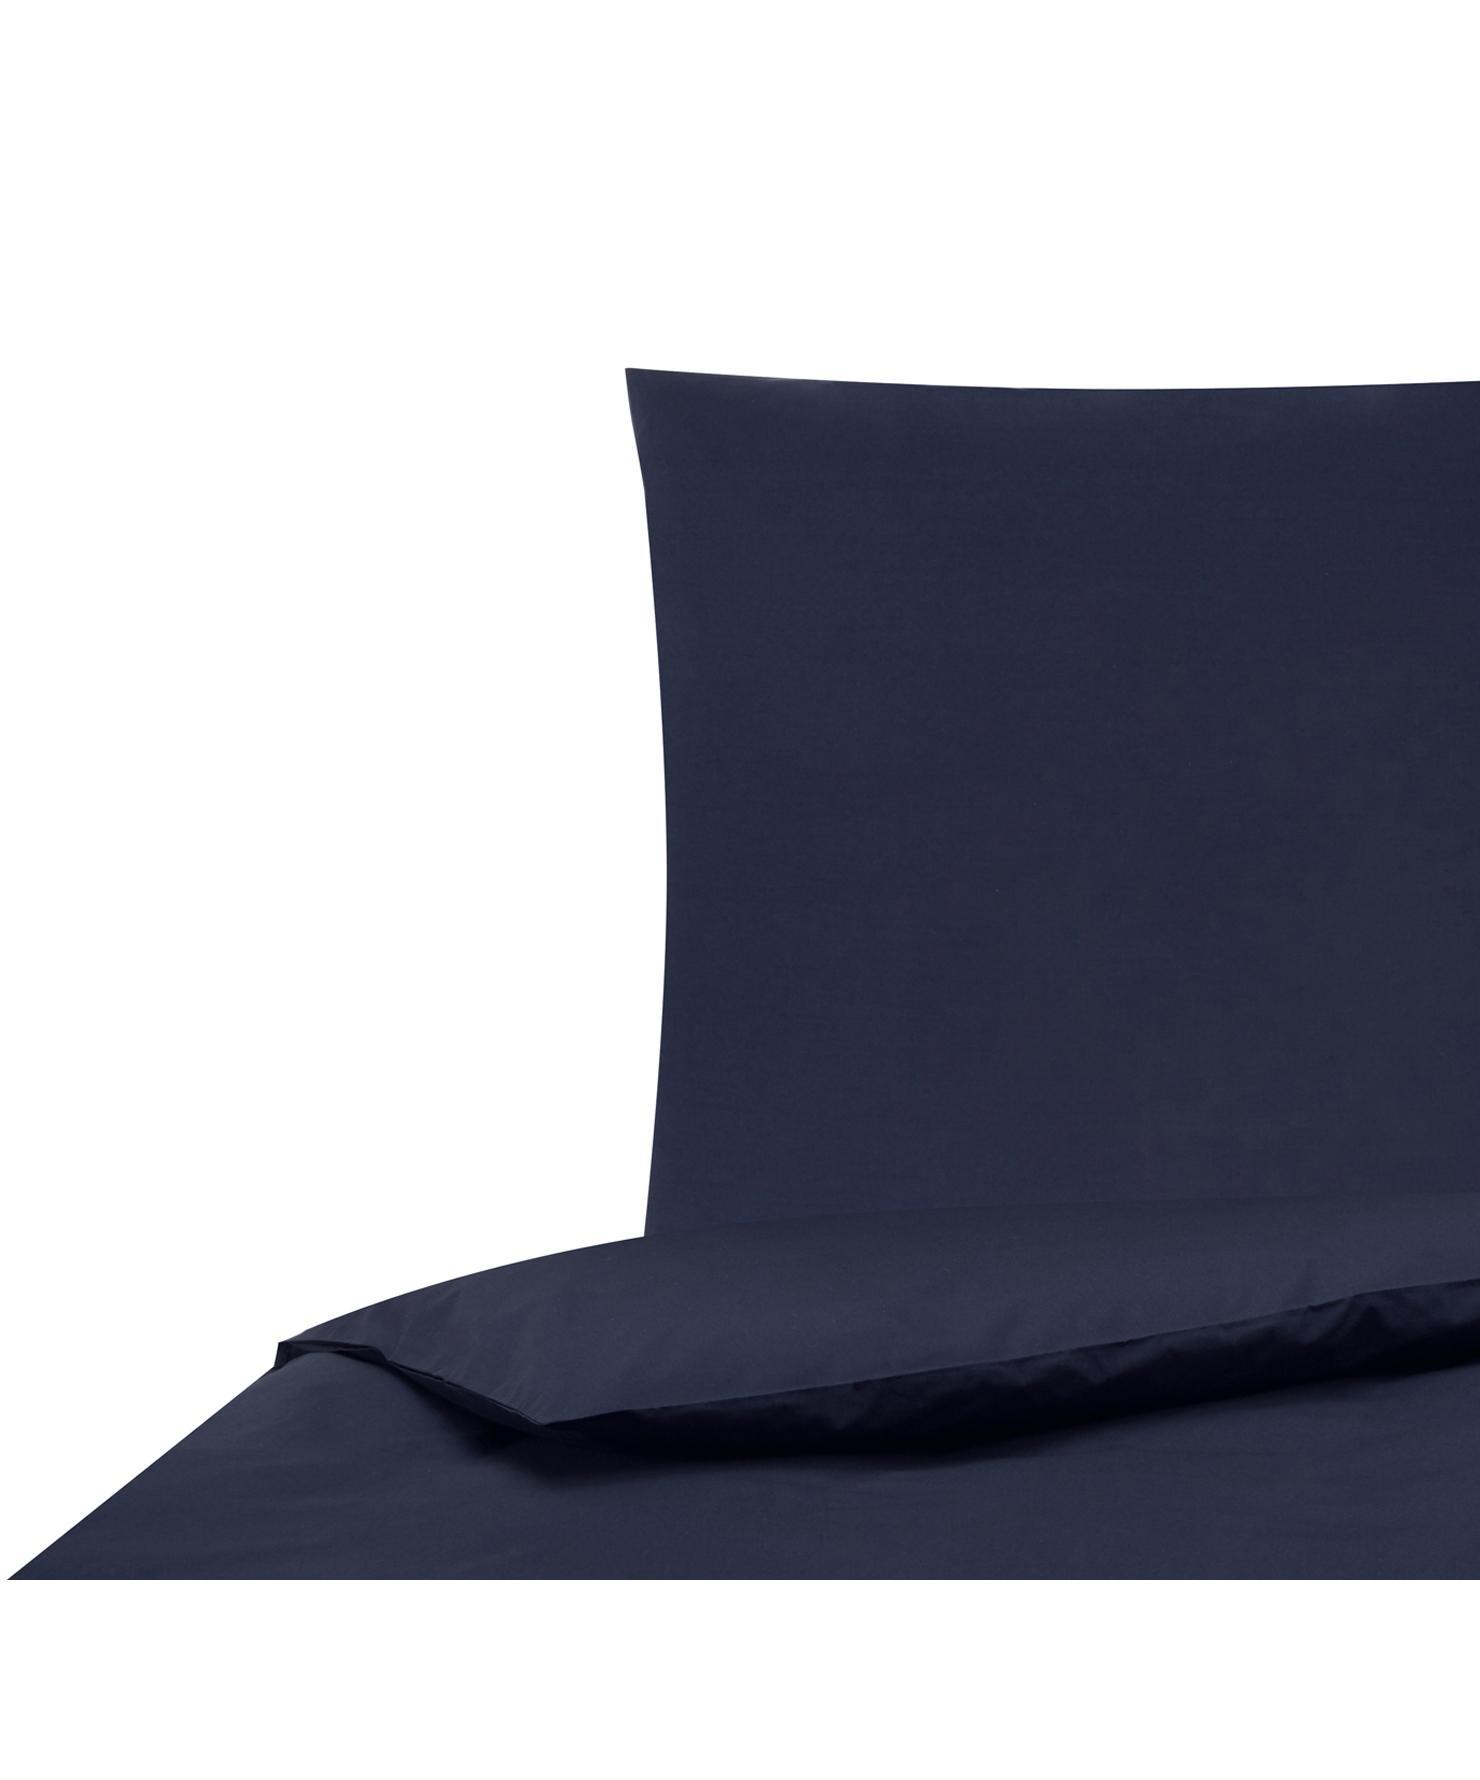 Perkal dekbedovertrek Elsie, Weeftechniek: perkal Draaddichtheid 200, Donkerblauw, 140 x 200 cm